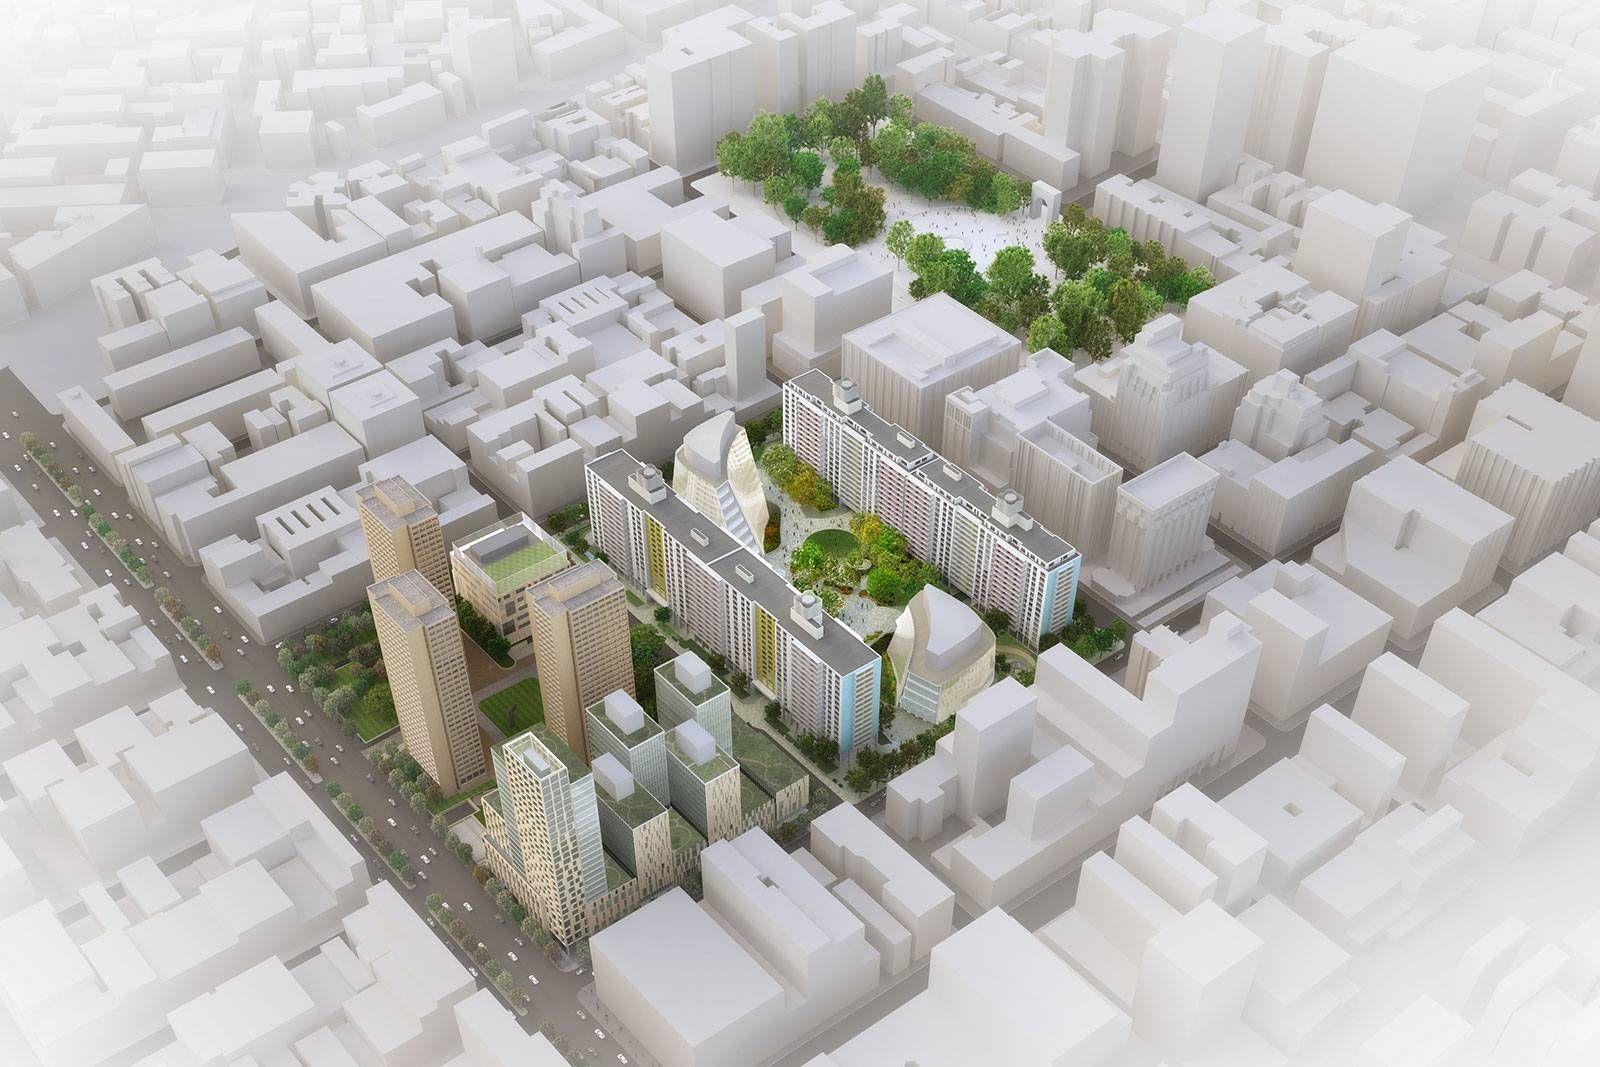 New York University Master Plan Projects Grimshaw Architects - New york university architecture